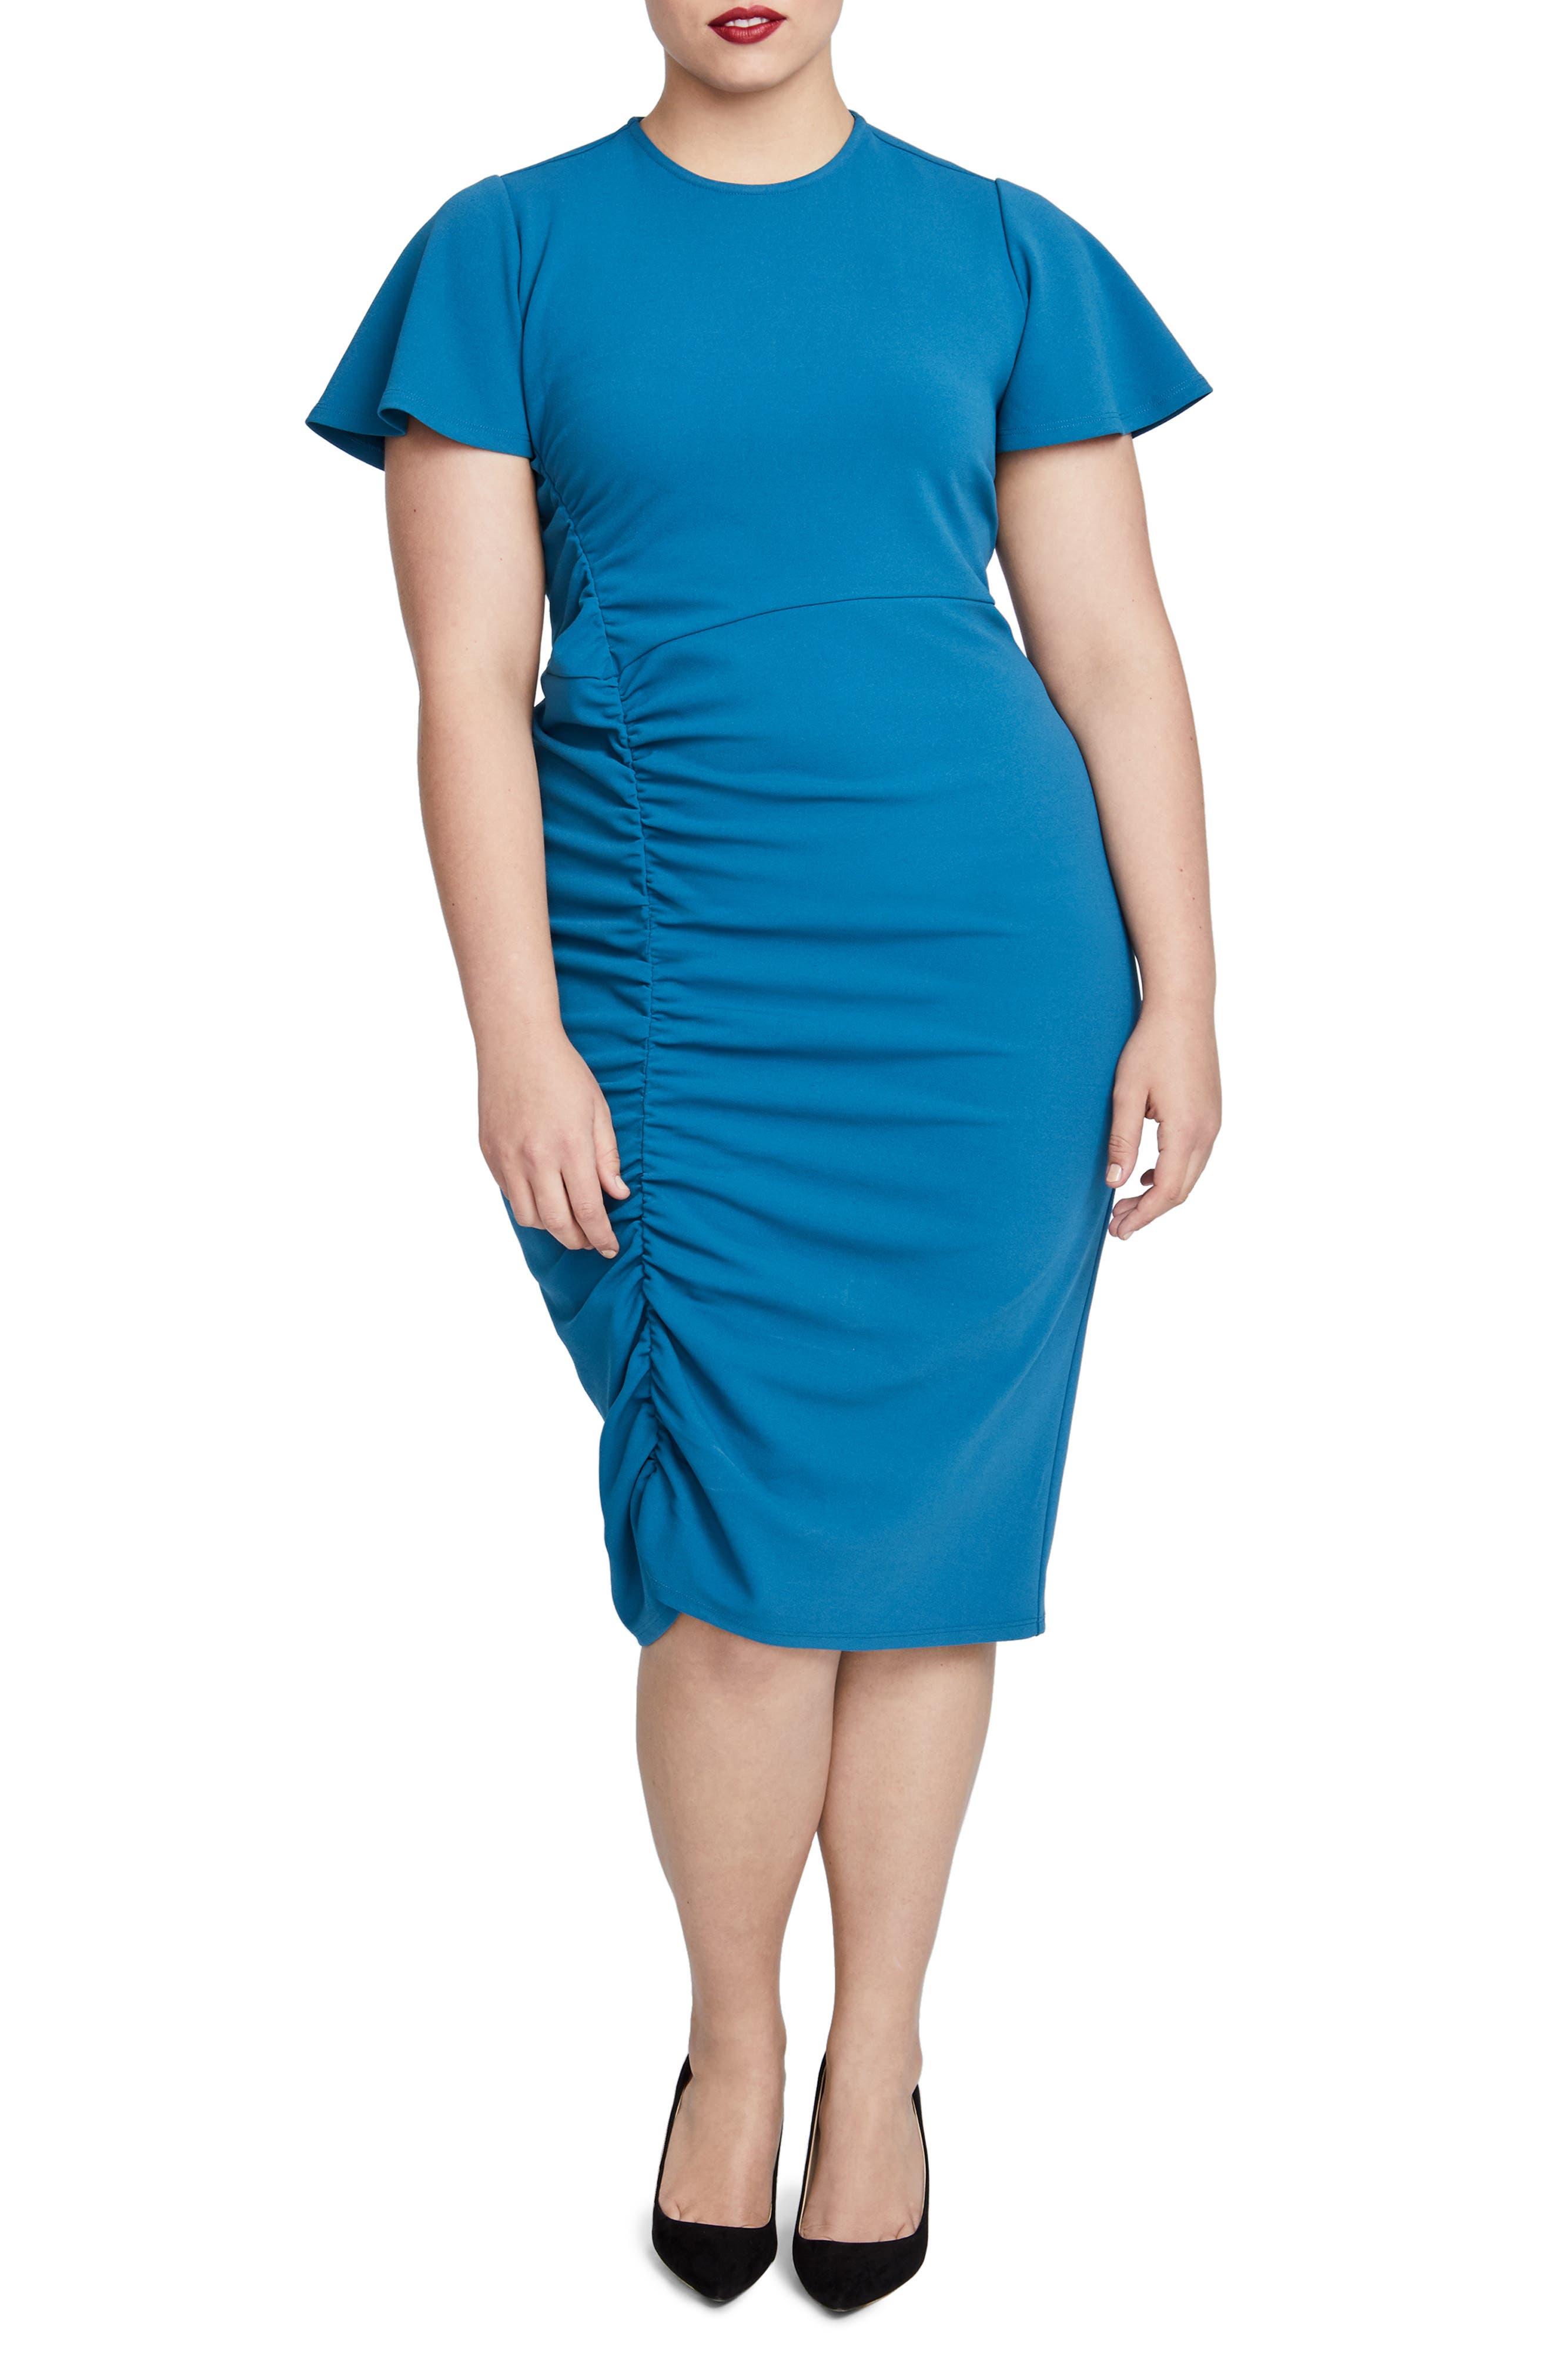 Plus Size Rachel Rachel Roy Pippa Ruched Sheath Dress, Blue